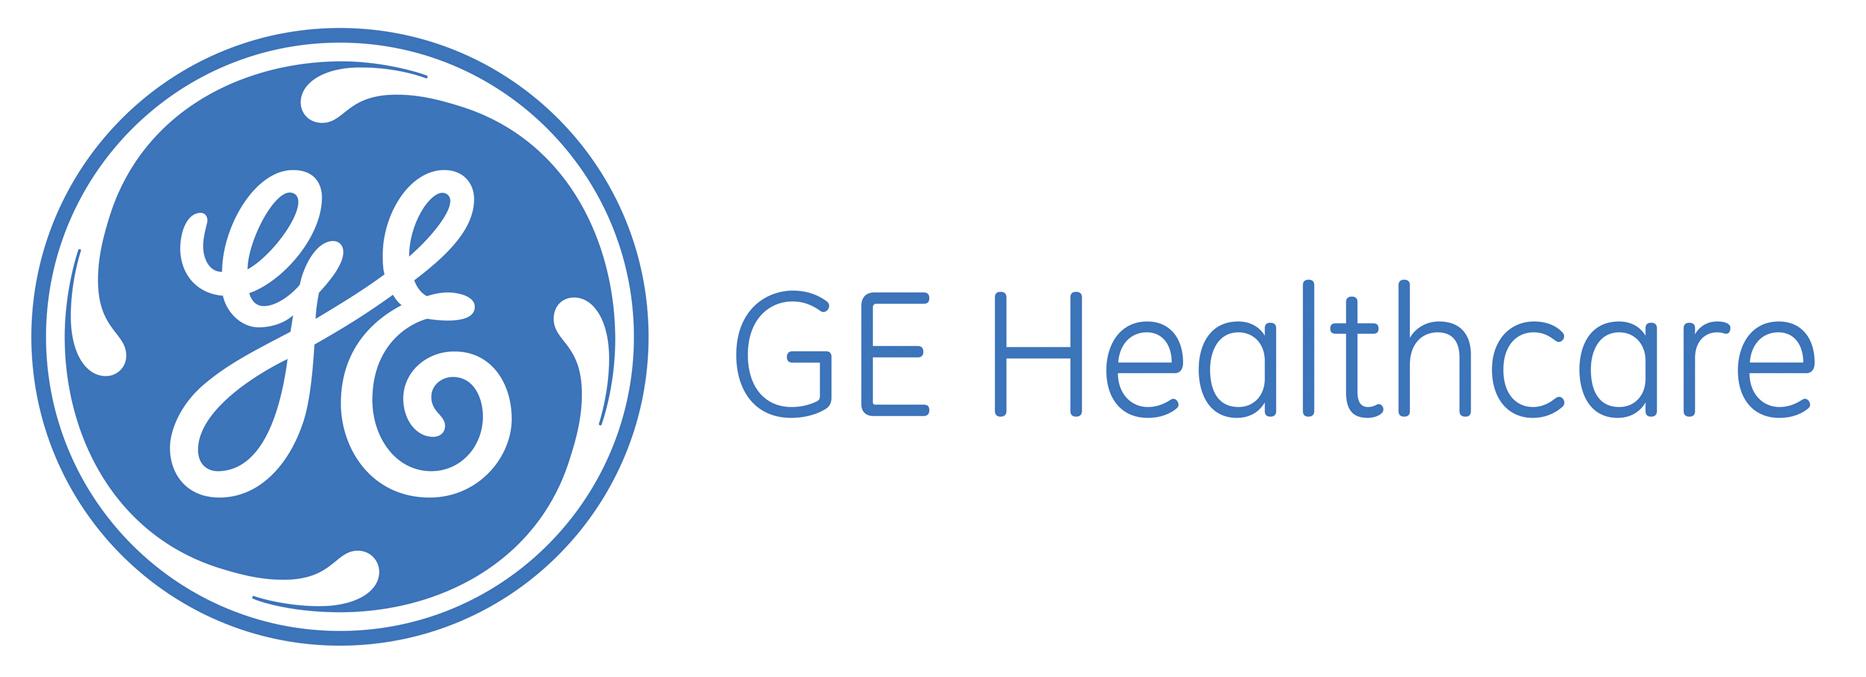 GE Healthcare Icon